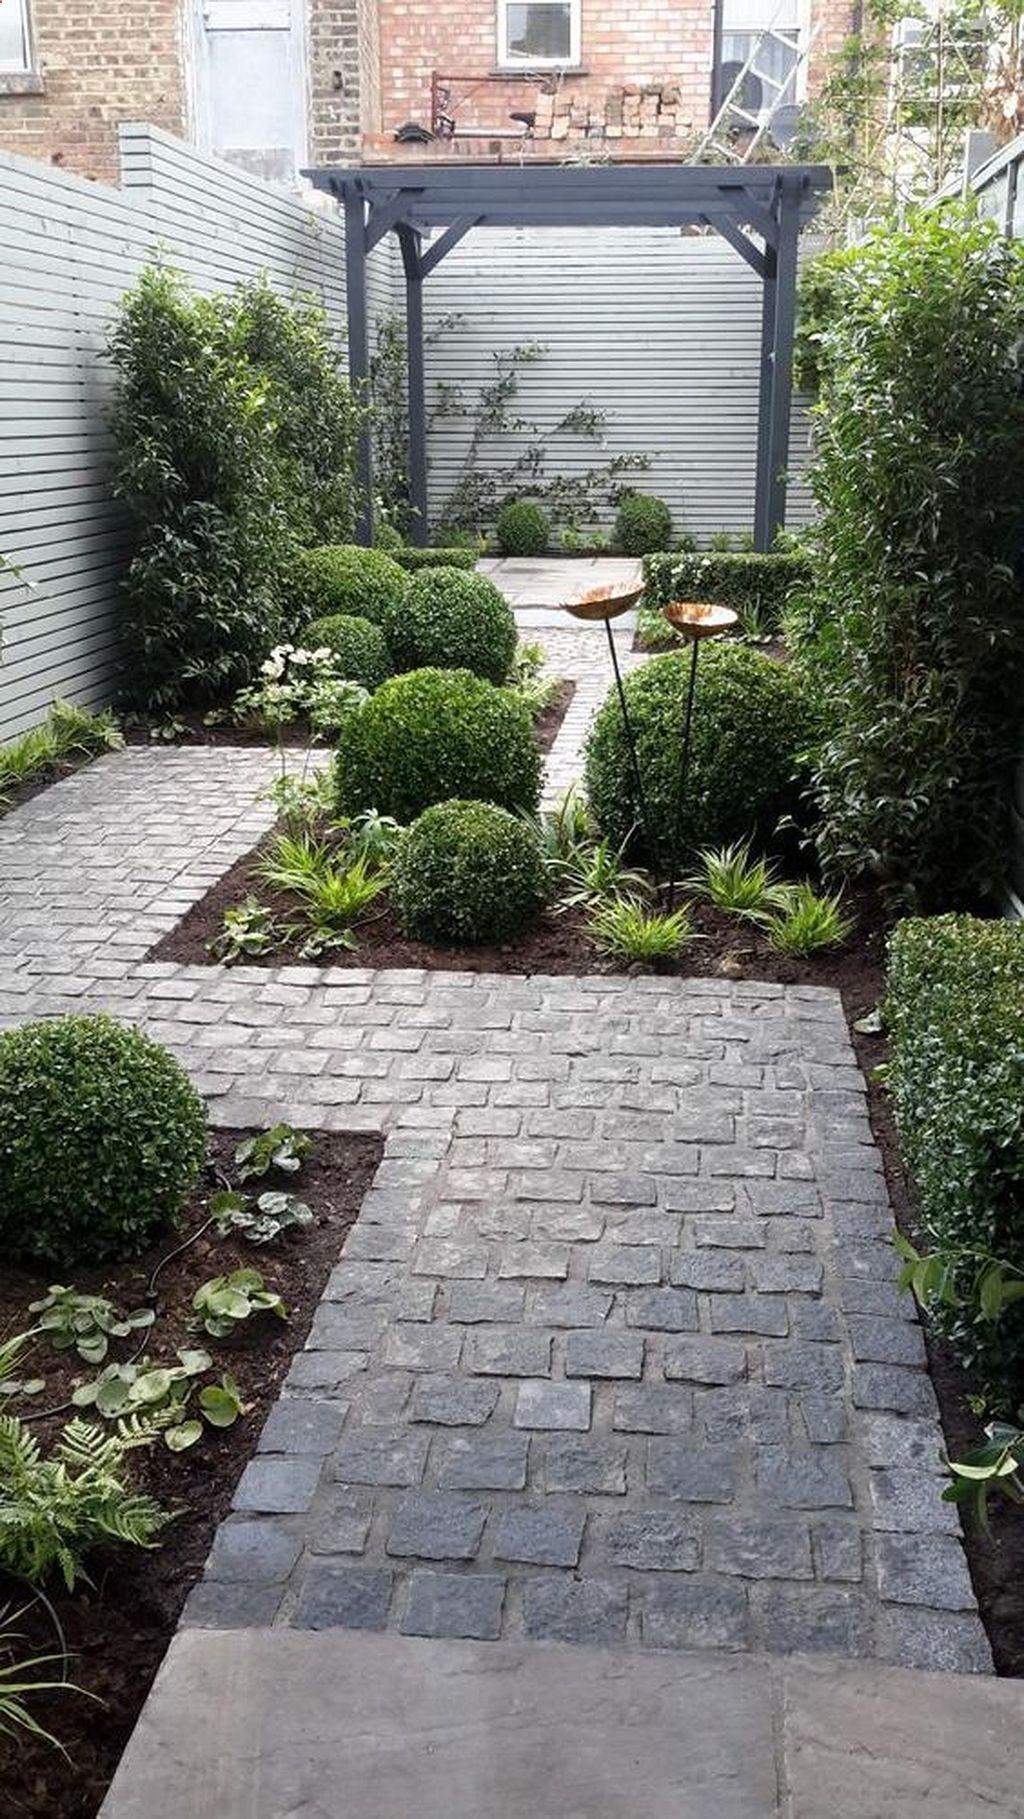 very small backyard ideas | small backyard ideas on a ... on Courtyard Ideas On A Budget id=38468